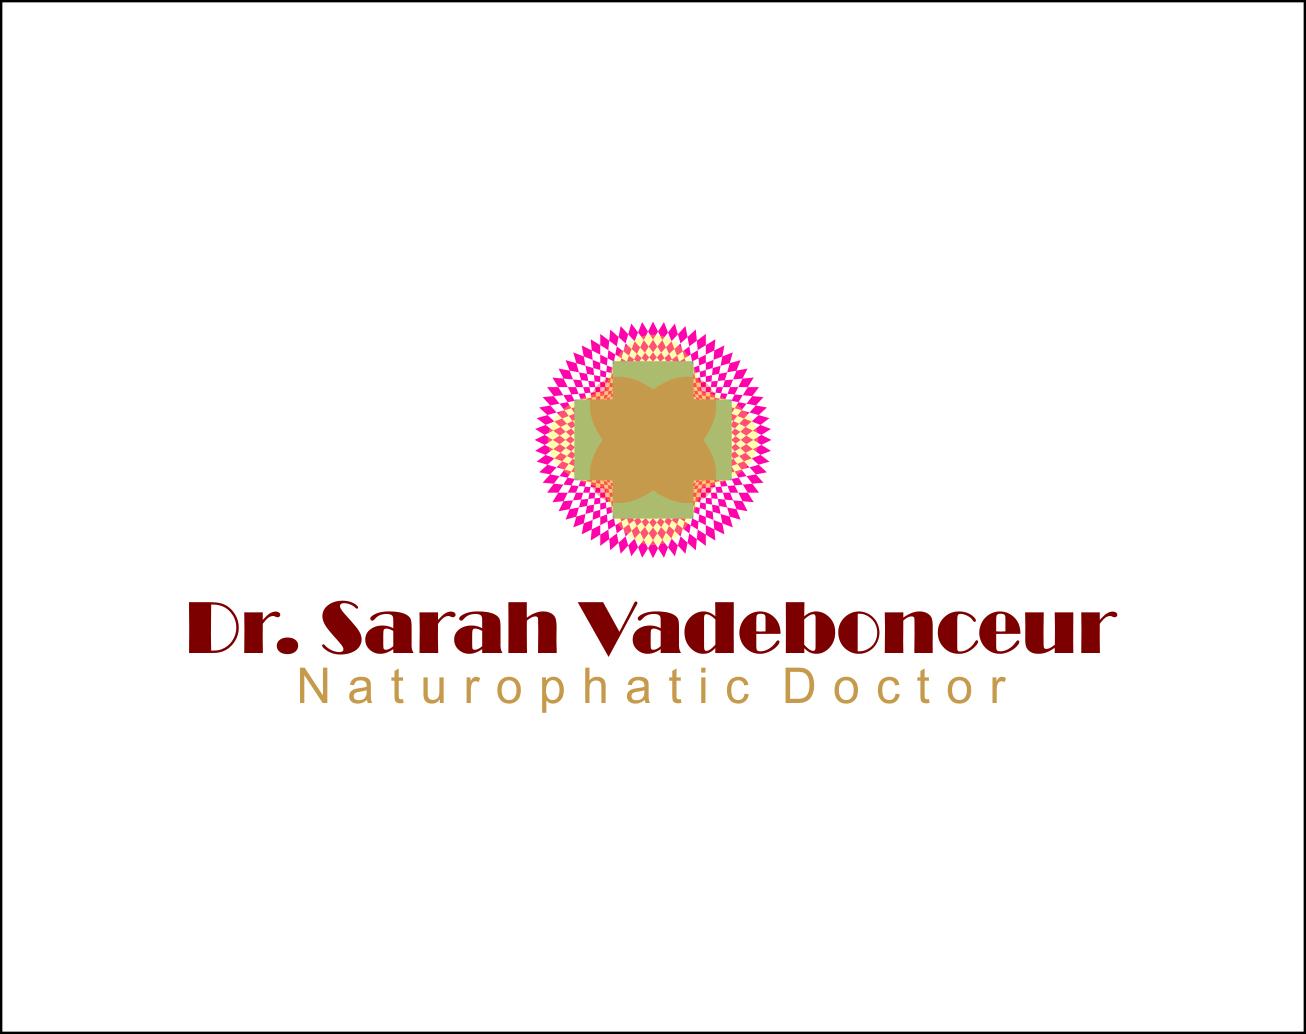 Logo Design by Agus Martoyo - Entry No. 48 in the Logo Design Contest New Logo Design for Dr. Sarah Vadeboncoeur, Naturopathic Doctor.